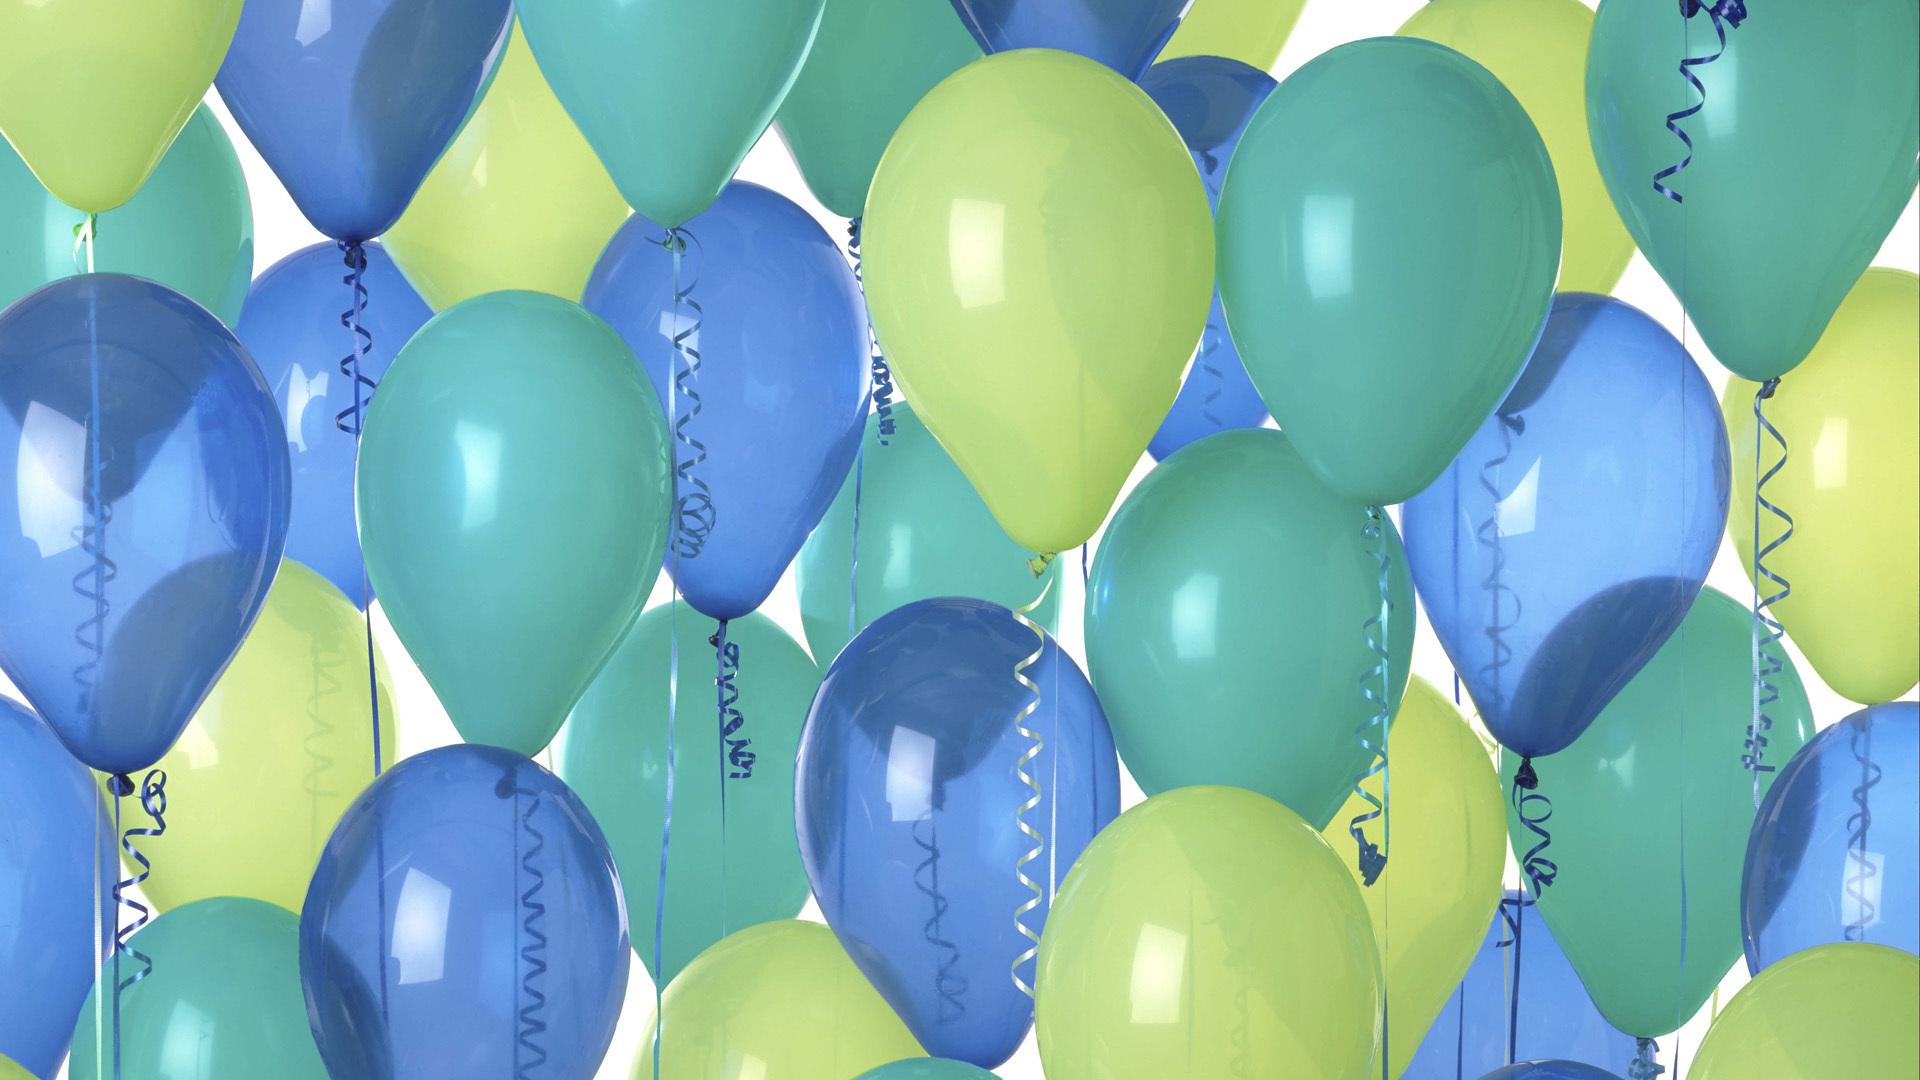 Birthday Balloons wallpaper   737291 1920x1080